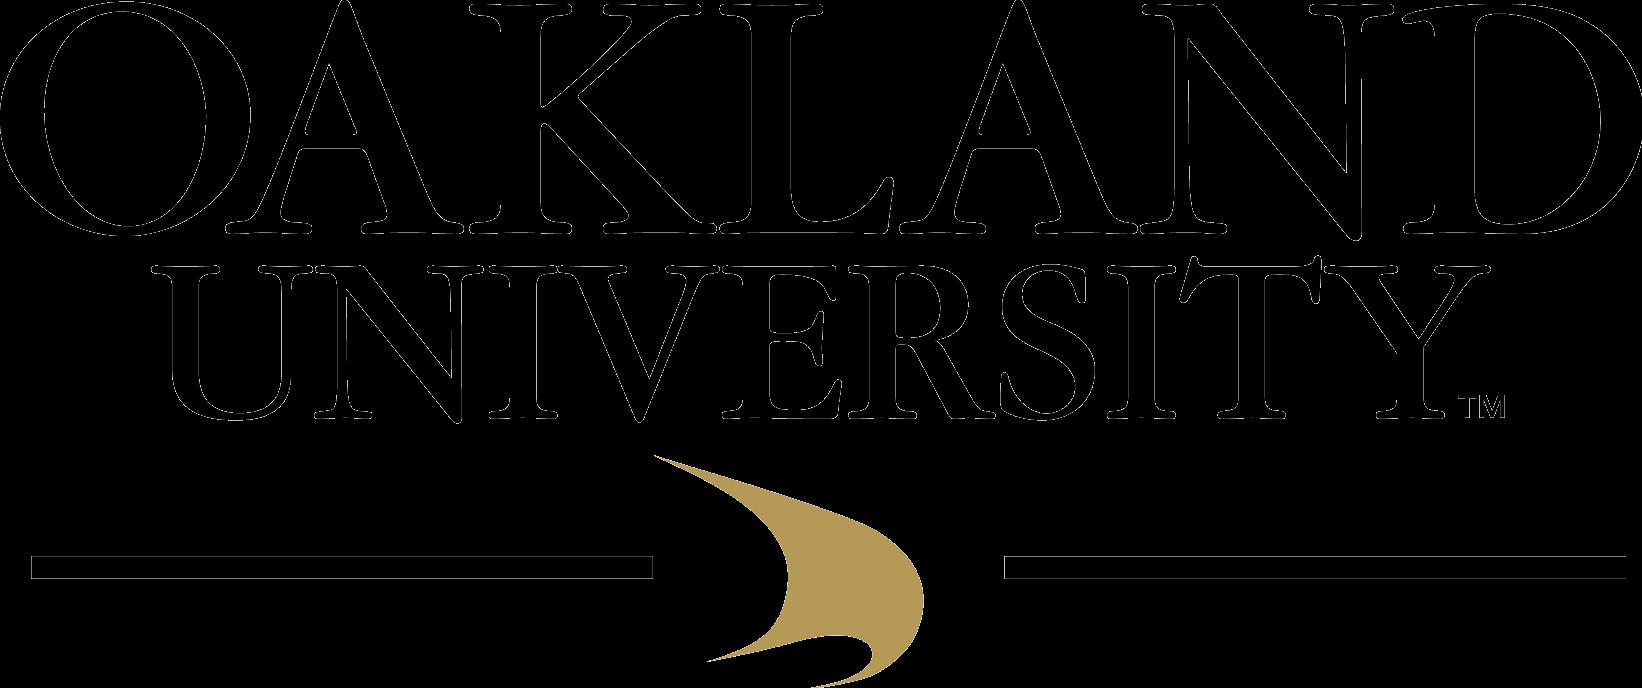 Oakland University Incubator.png